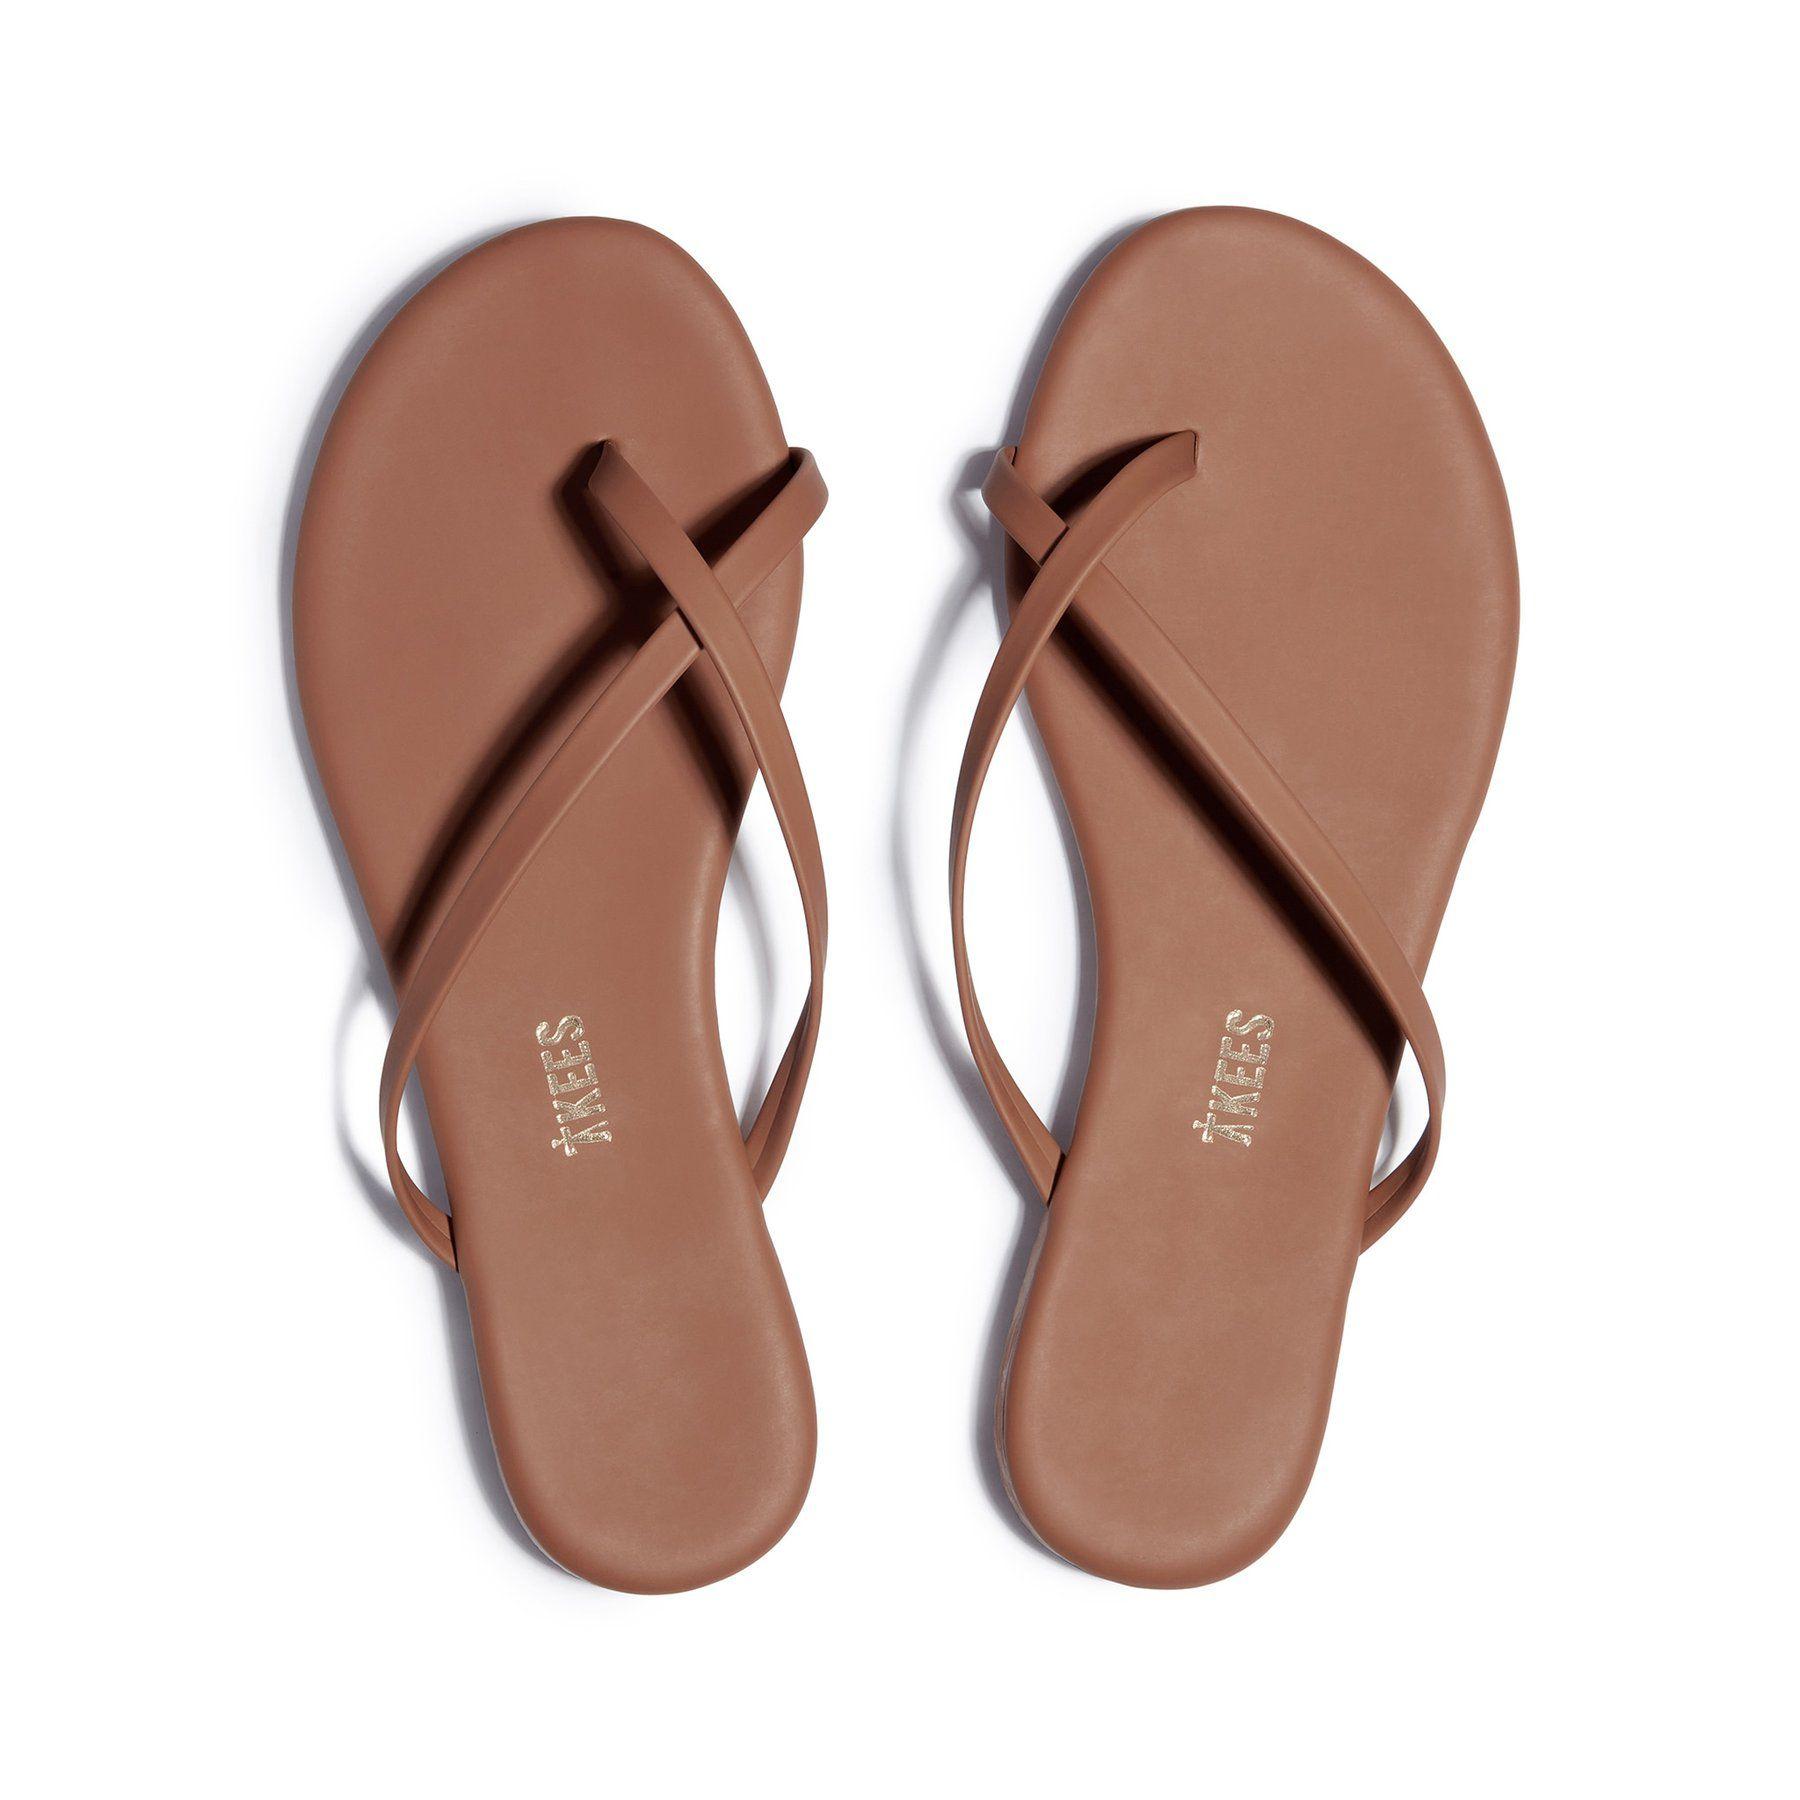 Tkees Riley Vegan Sandals